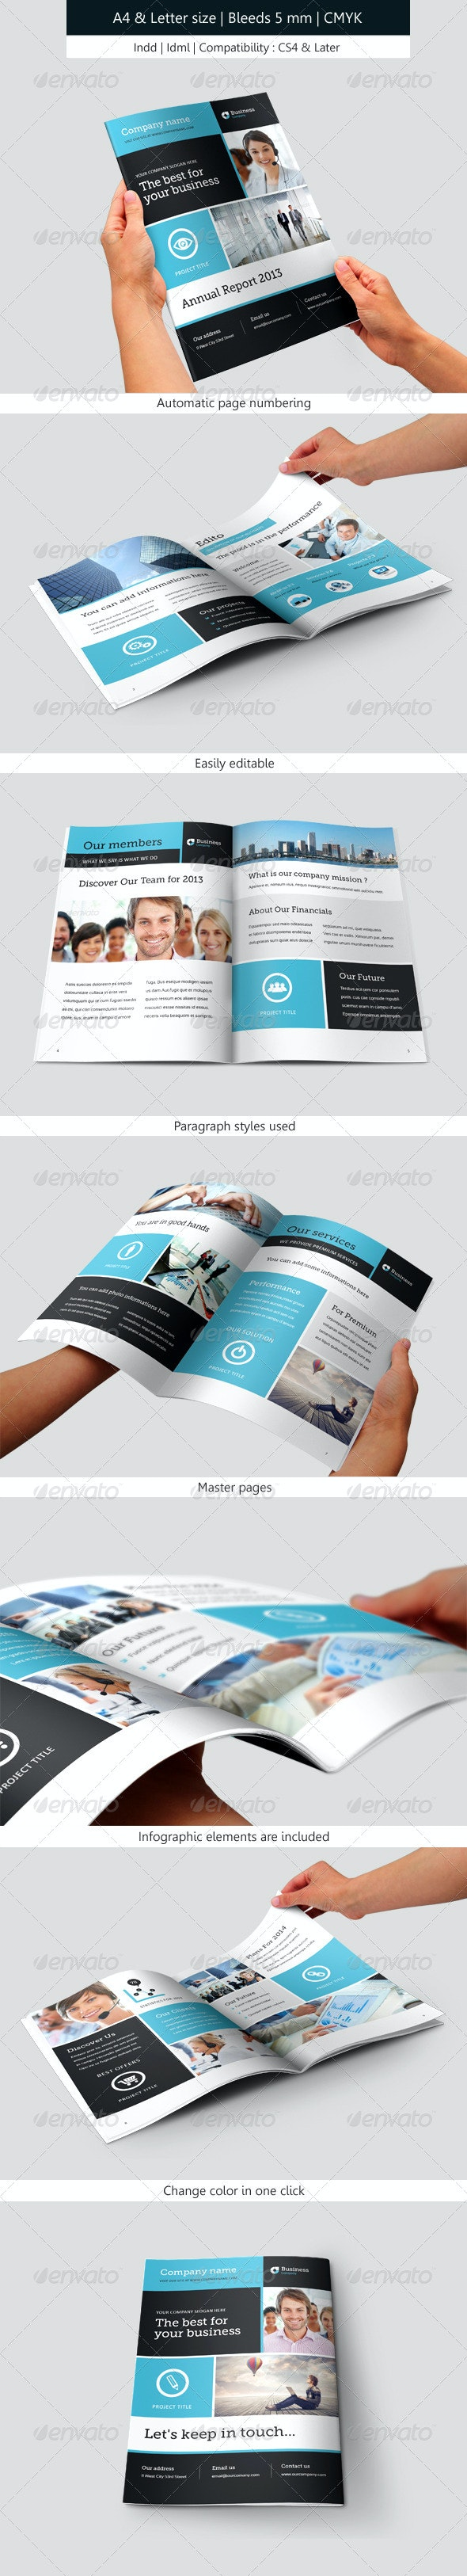 Corporate Brochure Template Annual Report - Informational Brochures